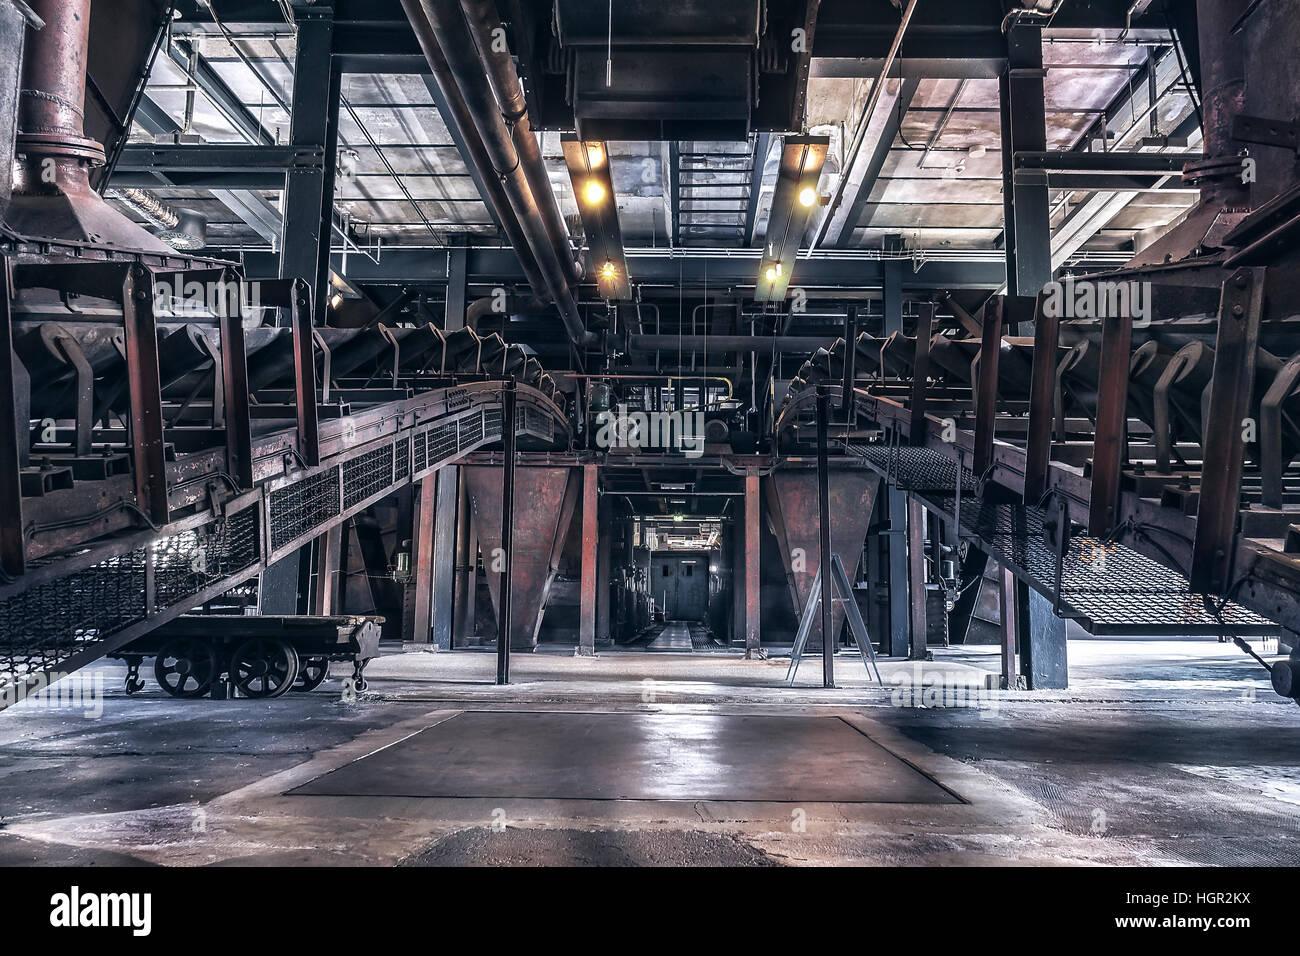 Indoor production scene of the 'Zeche Zollverein' in Essen-Germany. The closed coke oven plant is world - Stock Image